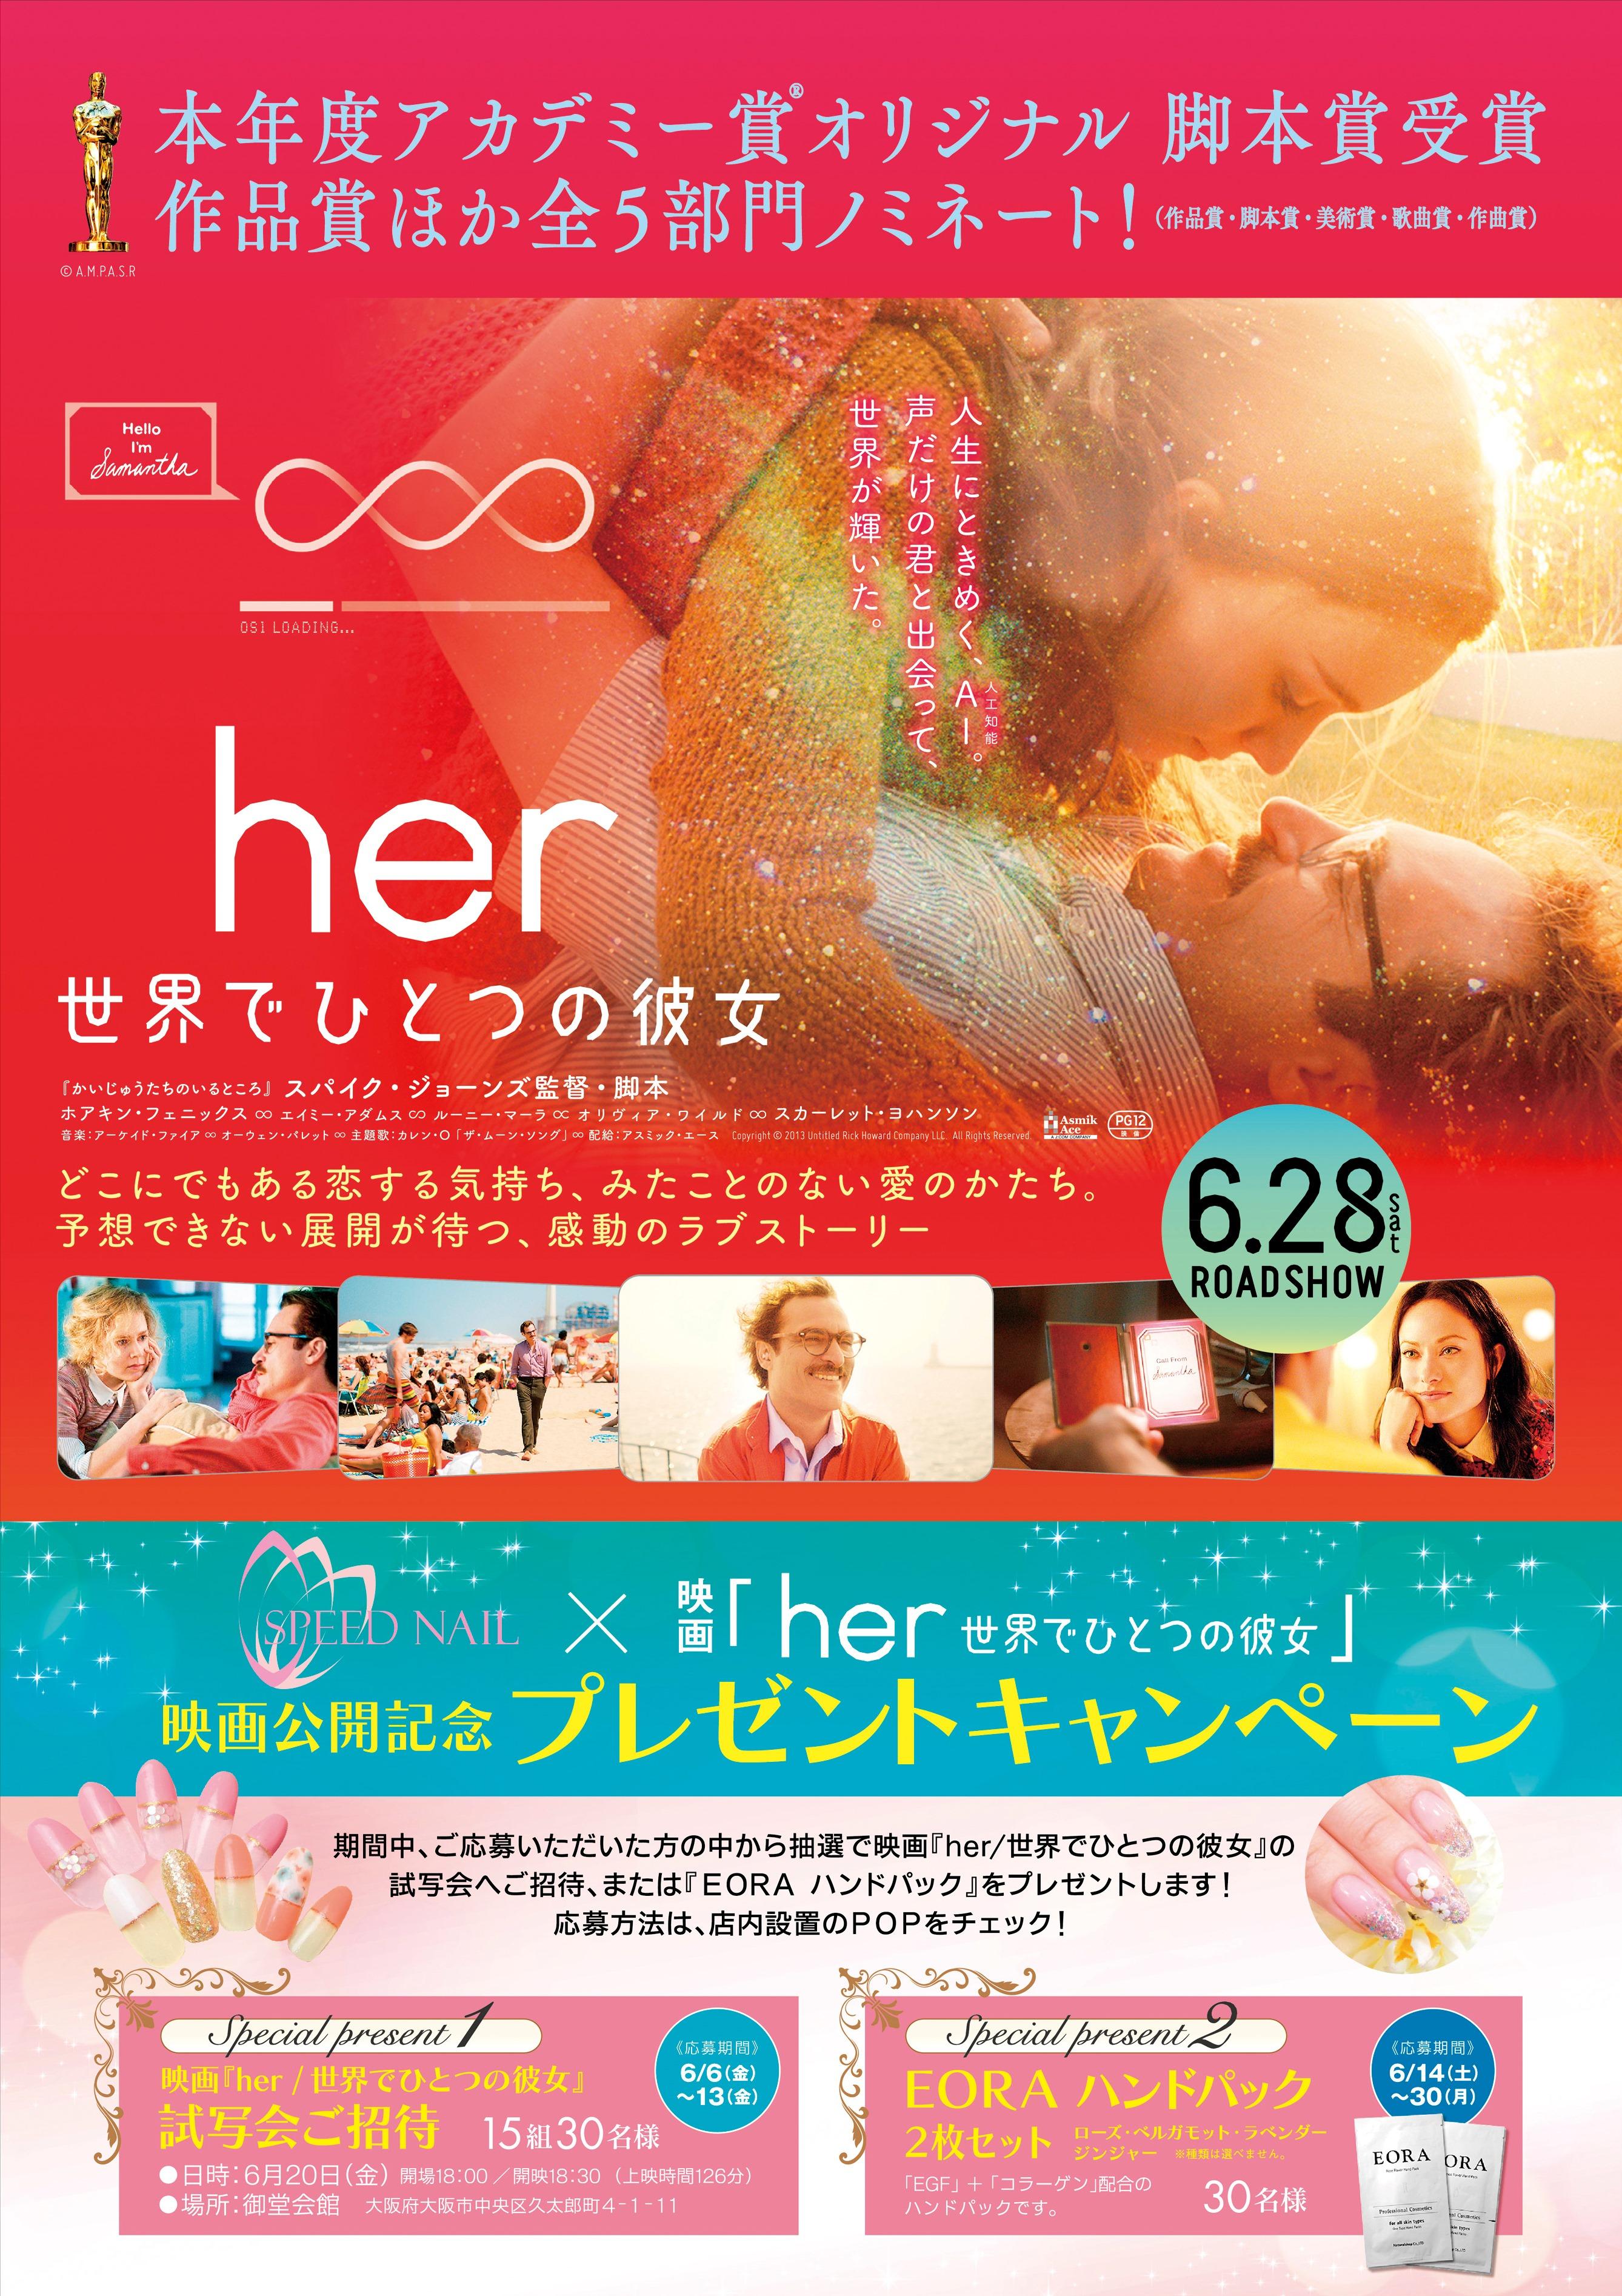 「her」スピードネイル.jpg